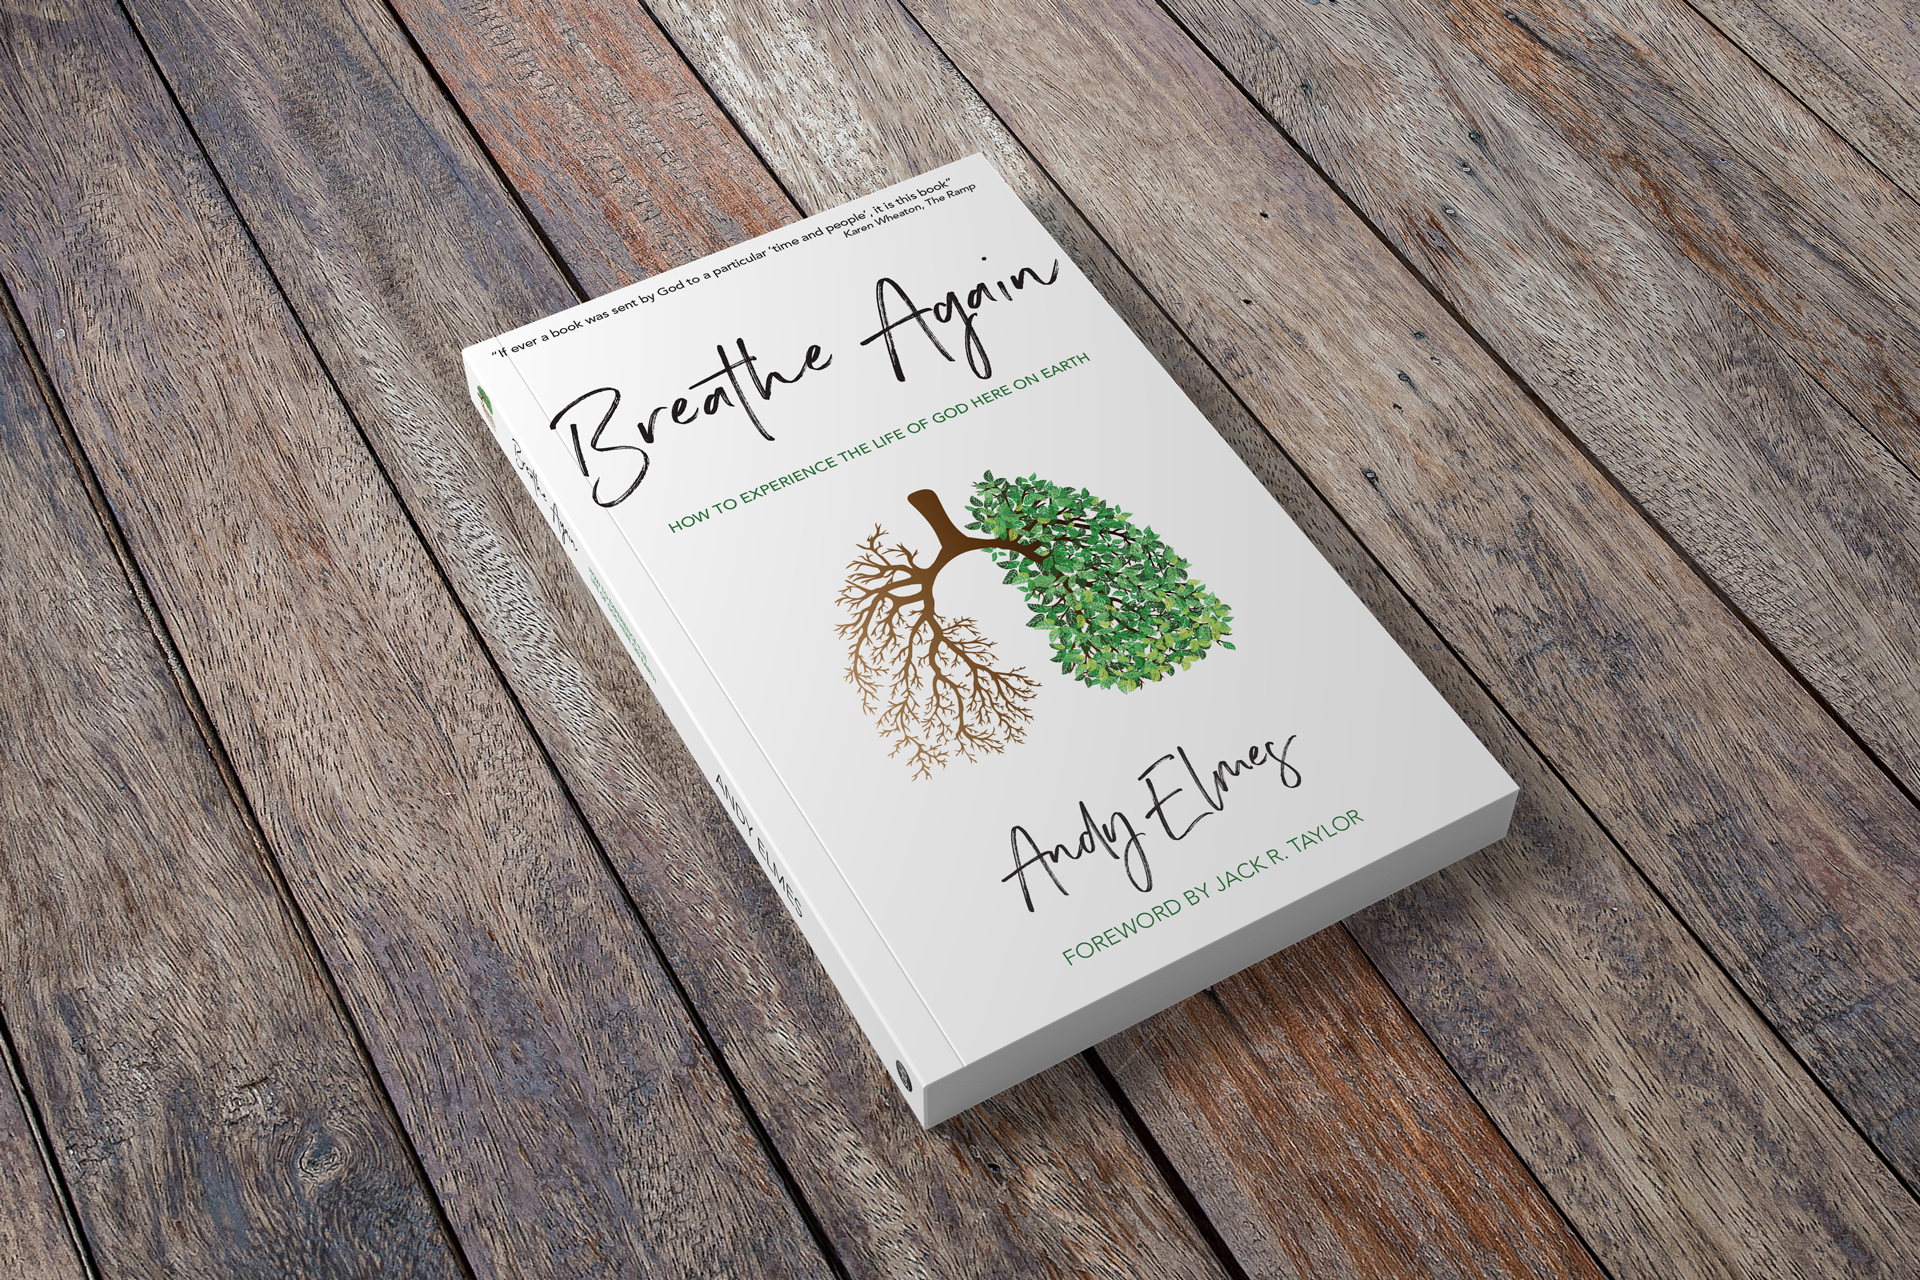 Breathe Again, book cover